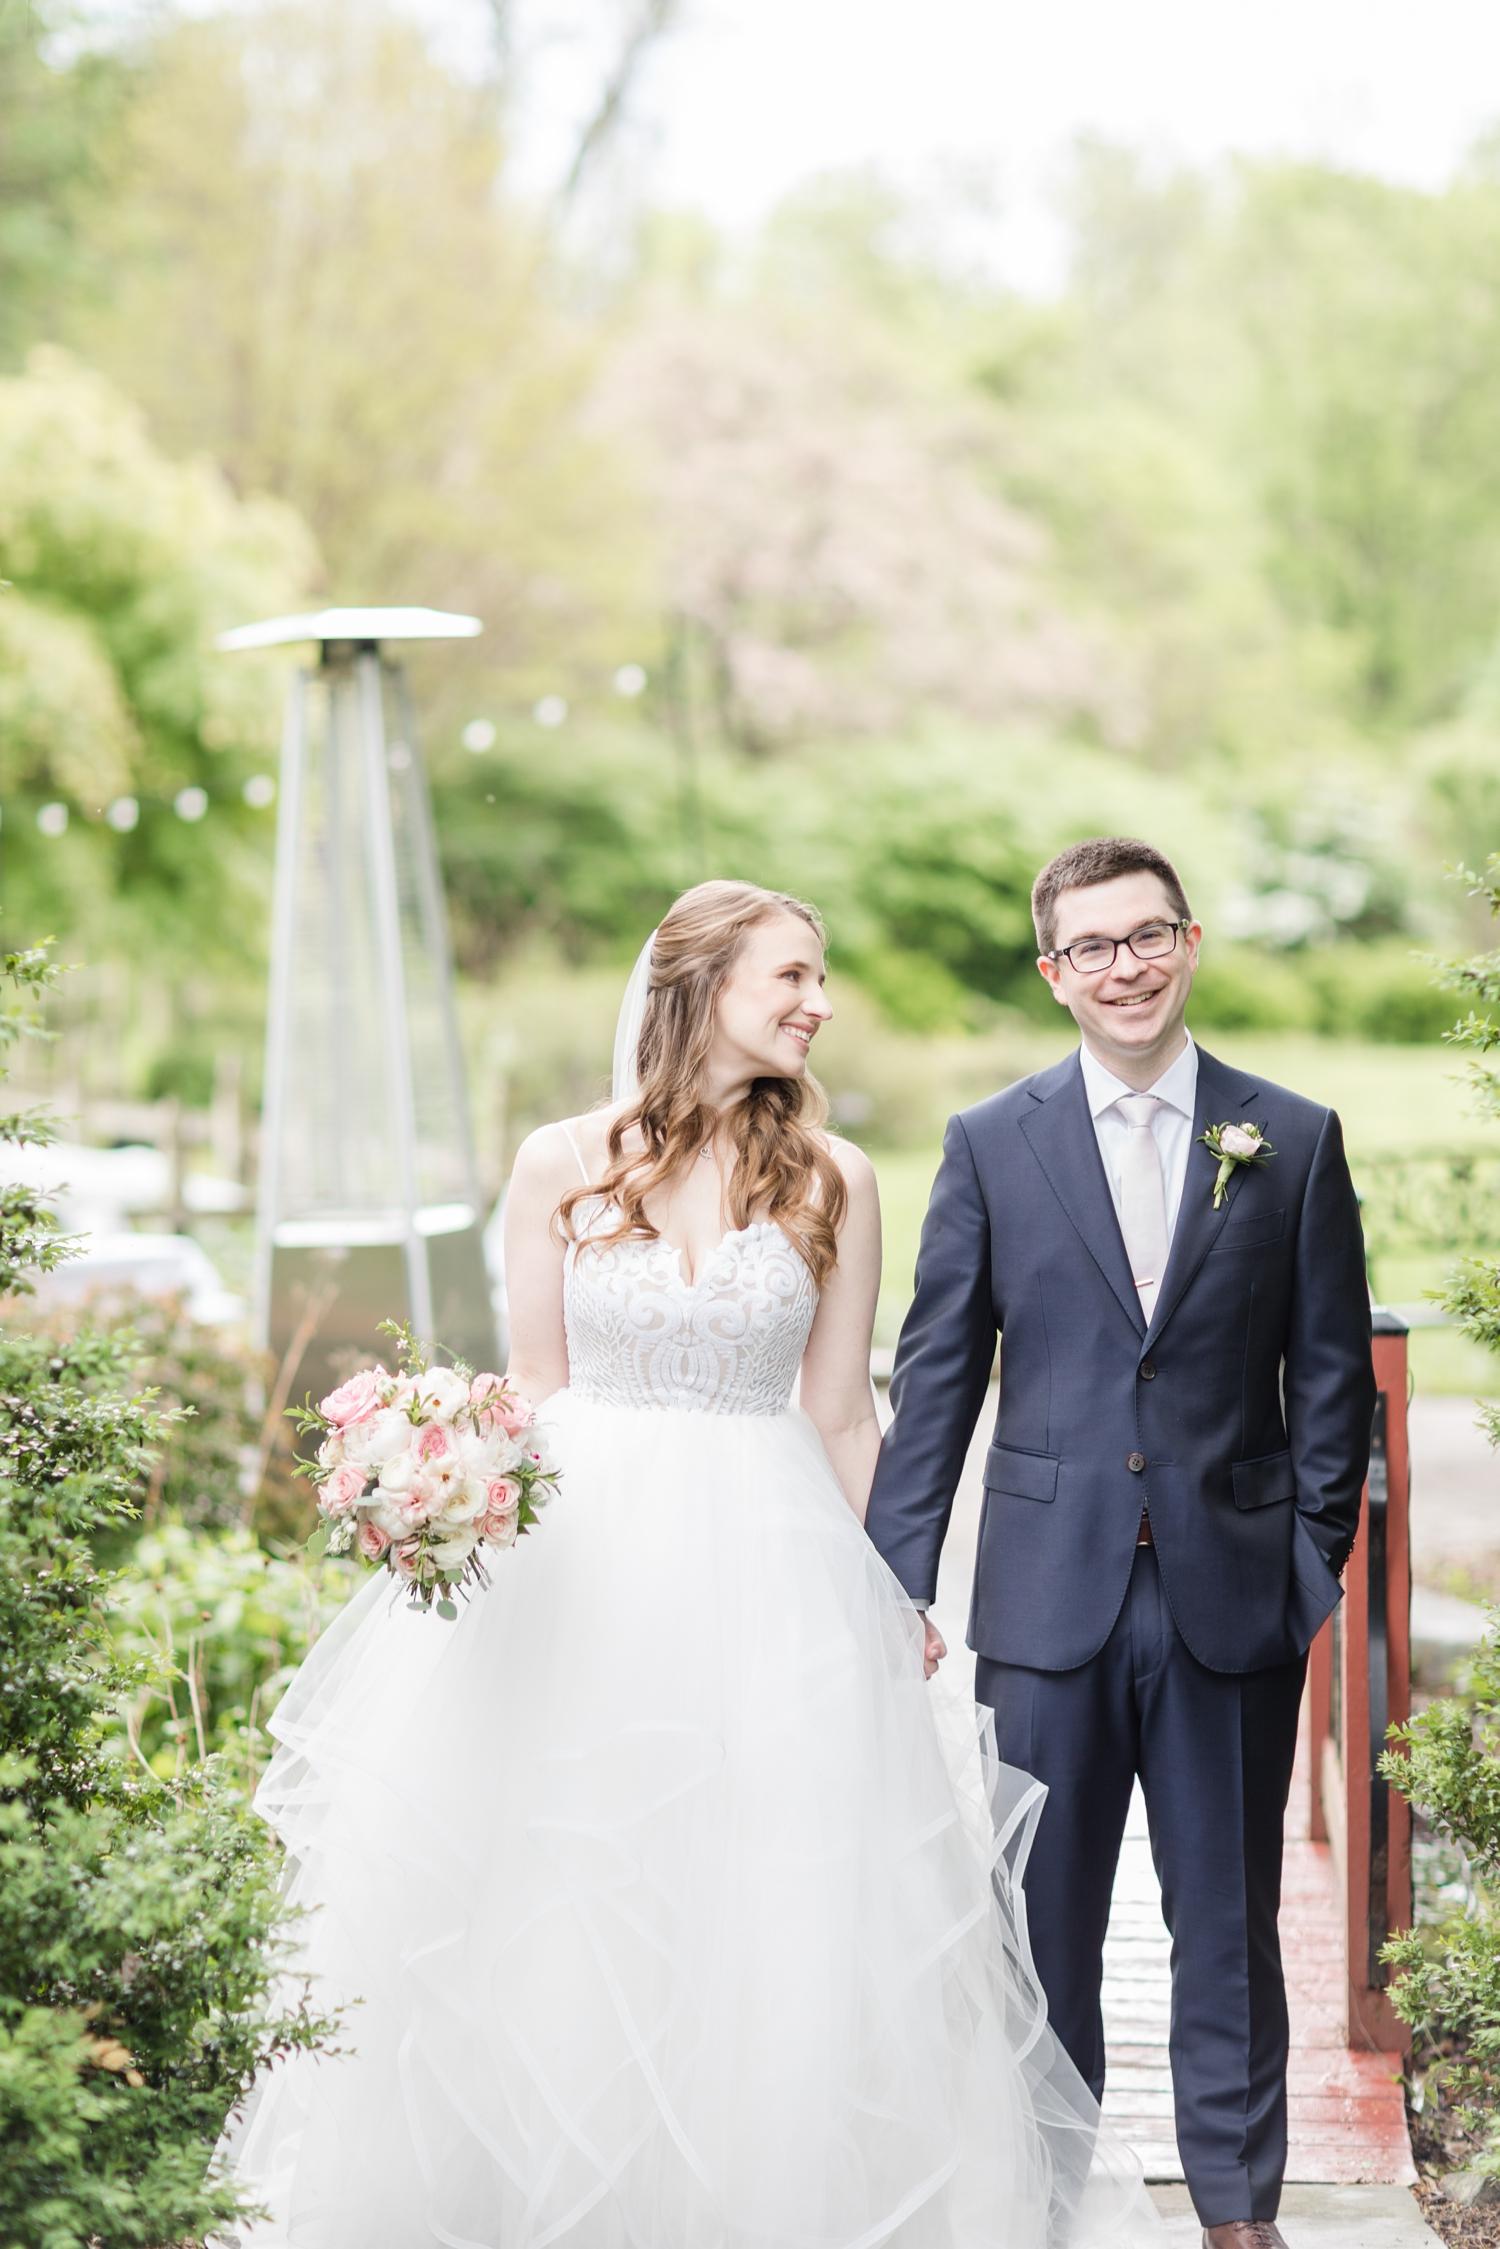 Hildebrand WEDDING HIGHLIGHTS-95_Elkridge-Furnace-Inn-wedding-Maryland-wedding-photographer-anna-grace-photography-photo.jpg